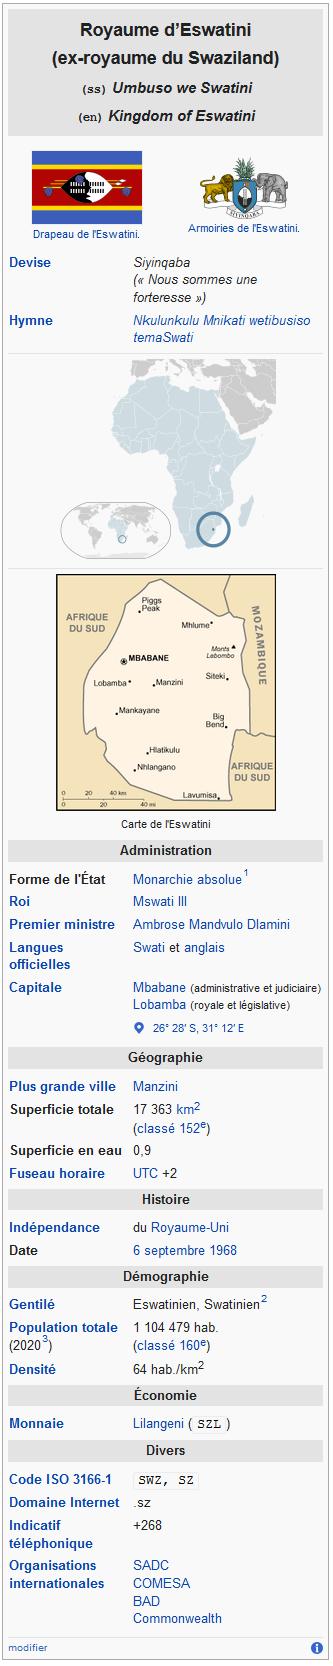 Screenshot_2020-05-05_Eswatini_—_Wikip